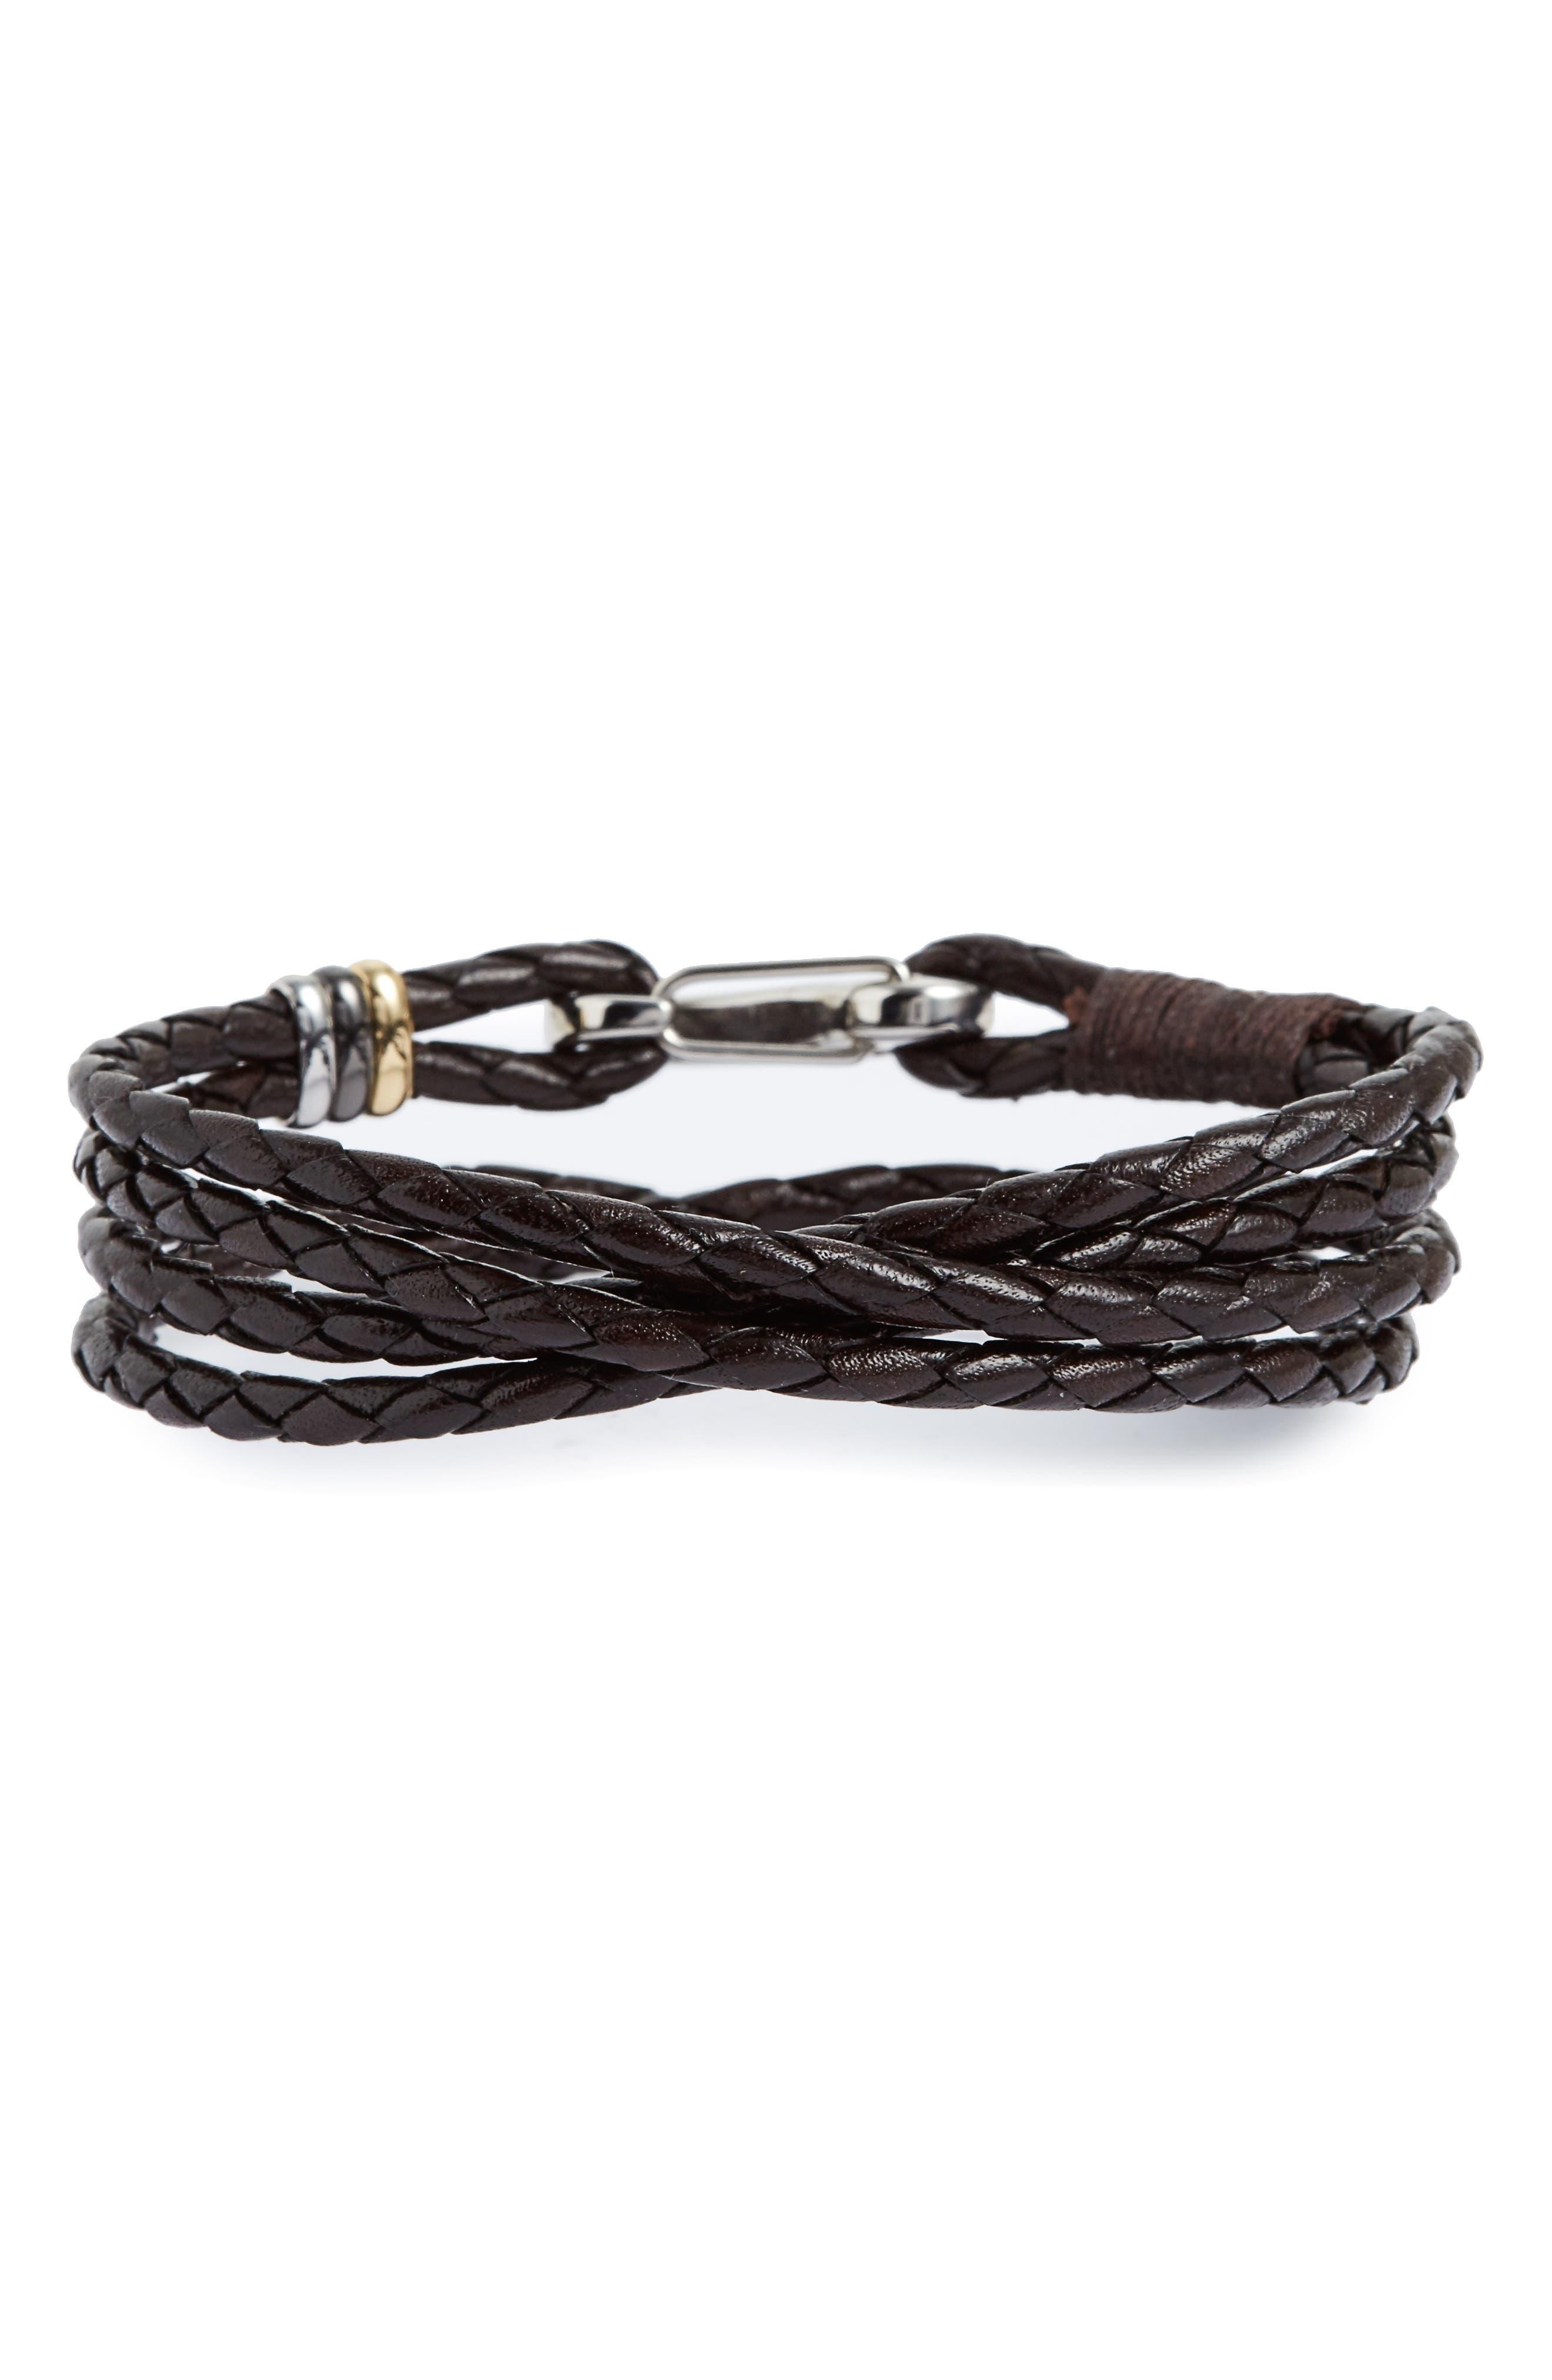 Braided Leather Wrap Bracelet,                             Main thumbnail 1, color,                             Chocolate